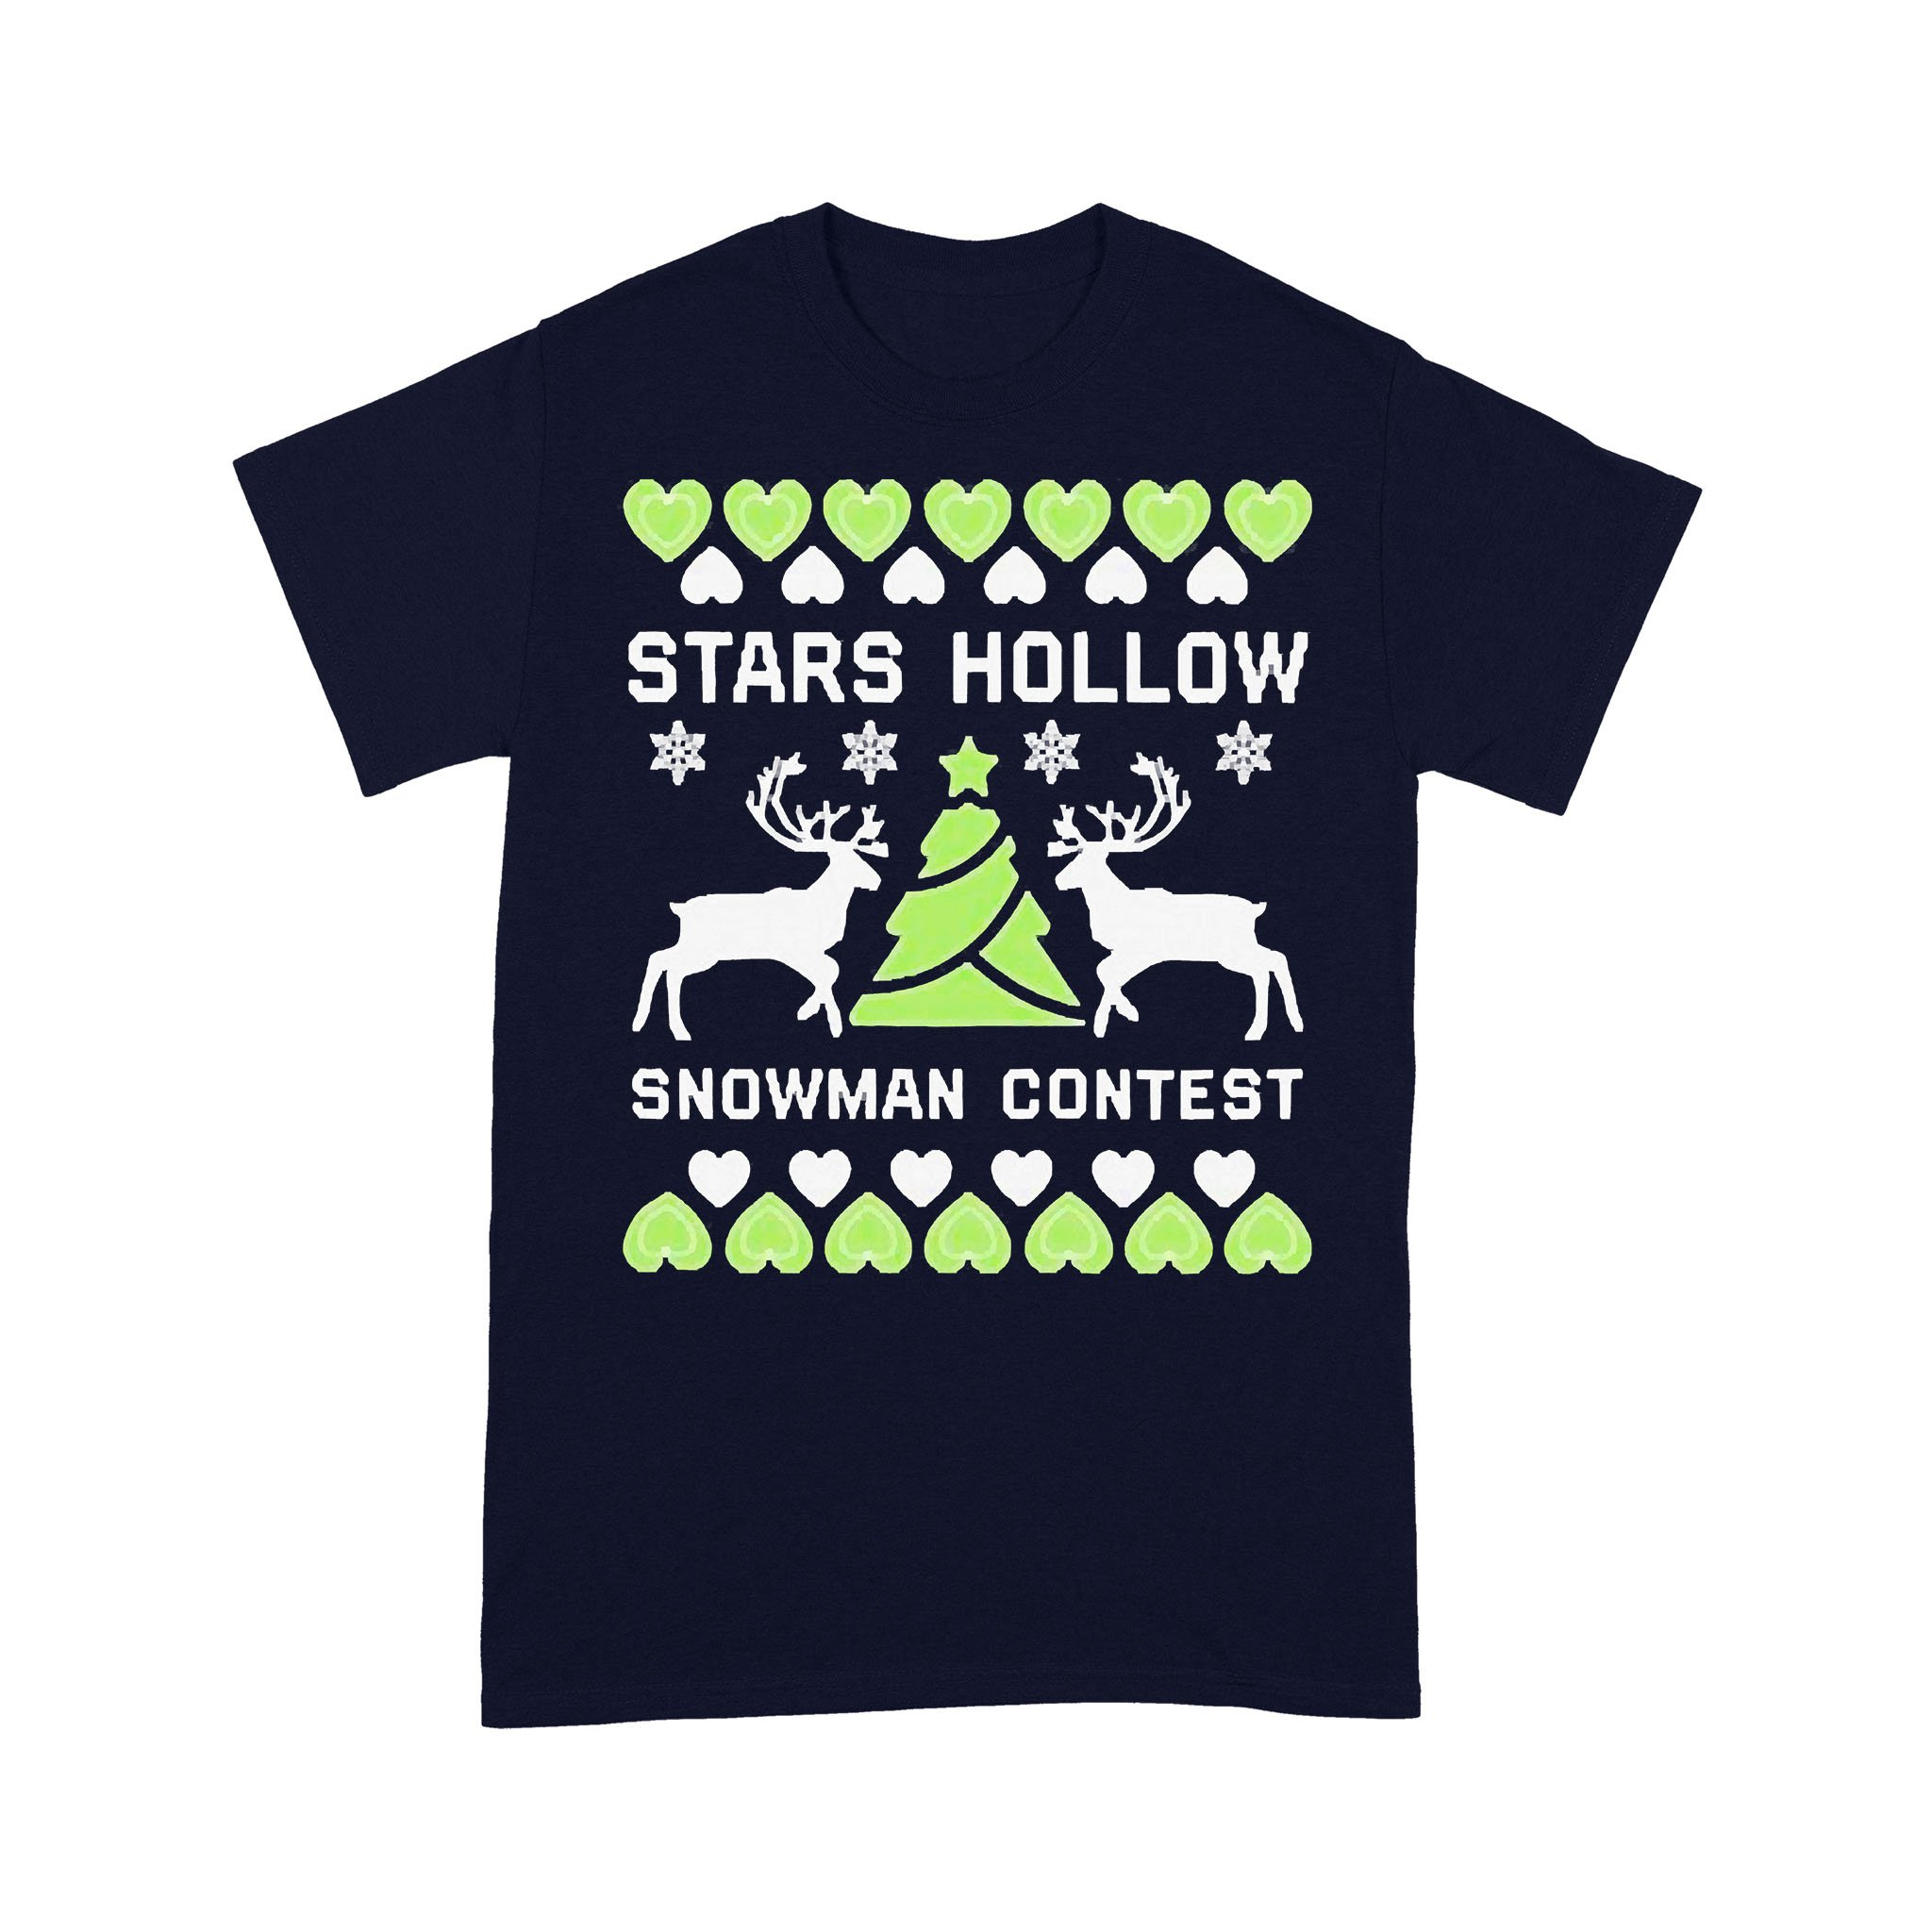 Stars Hollow Snowman Contest Christmas T-shirt